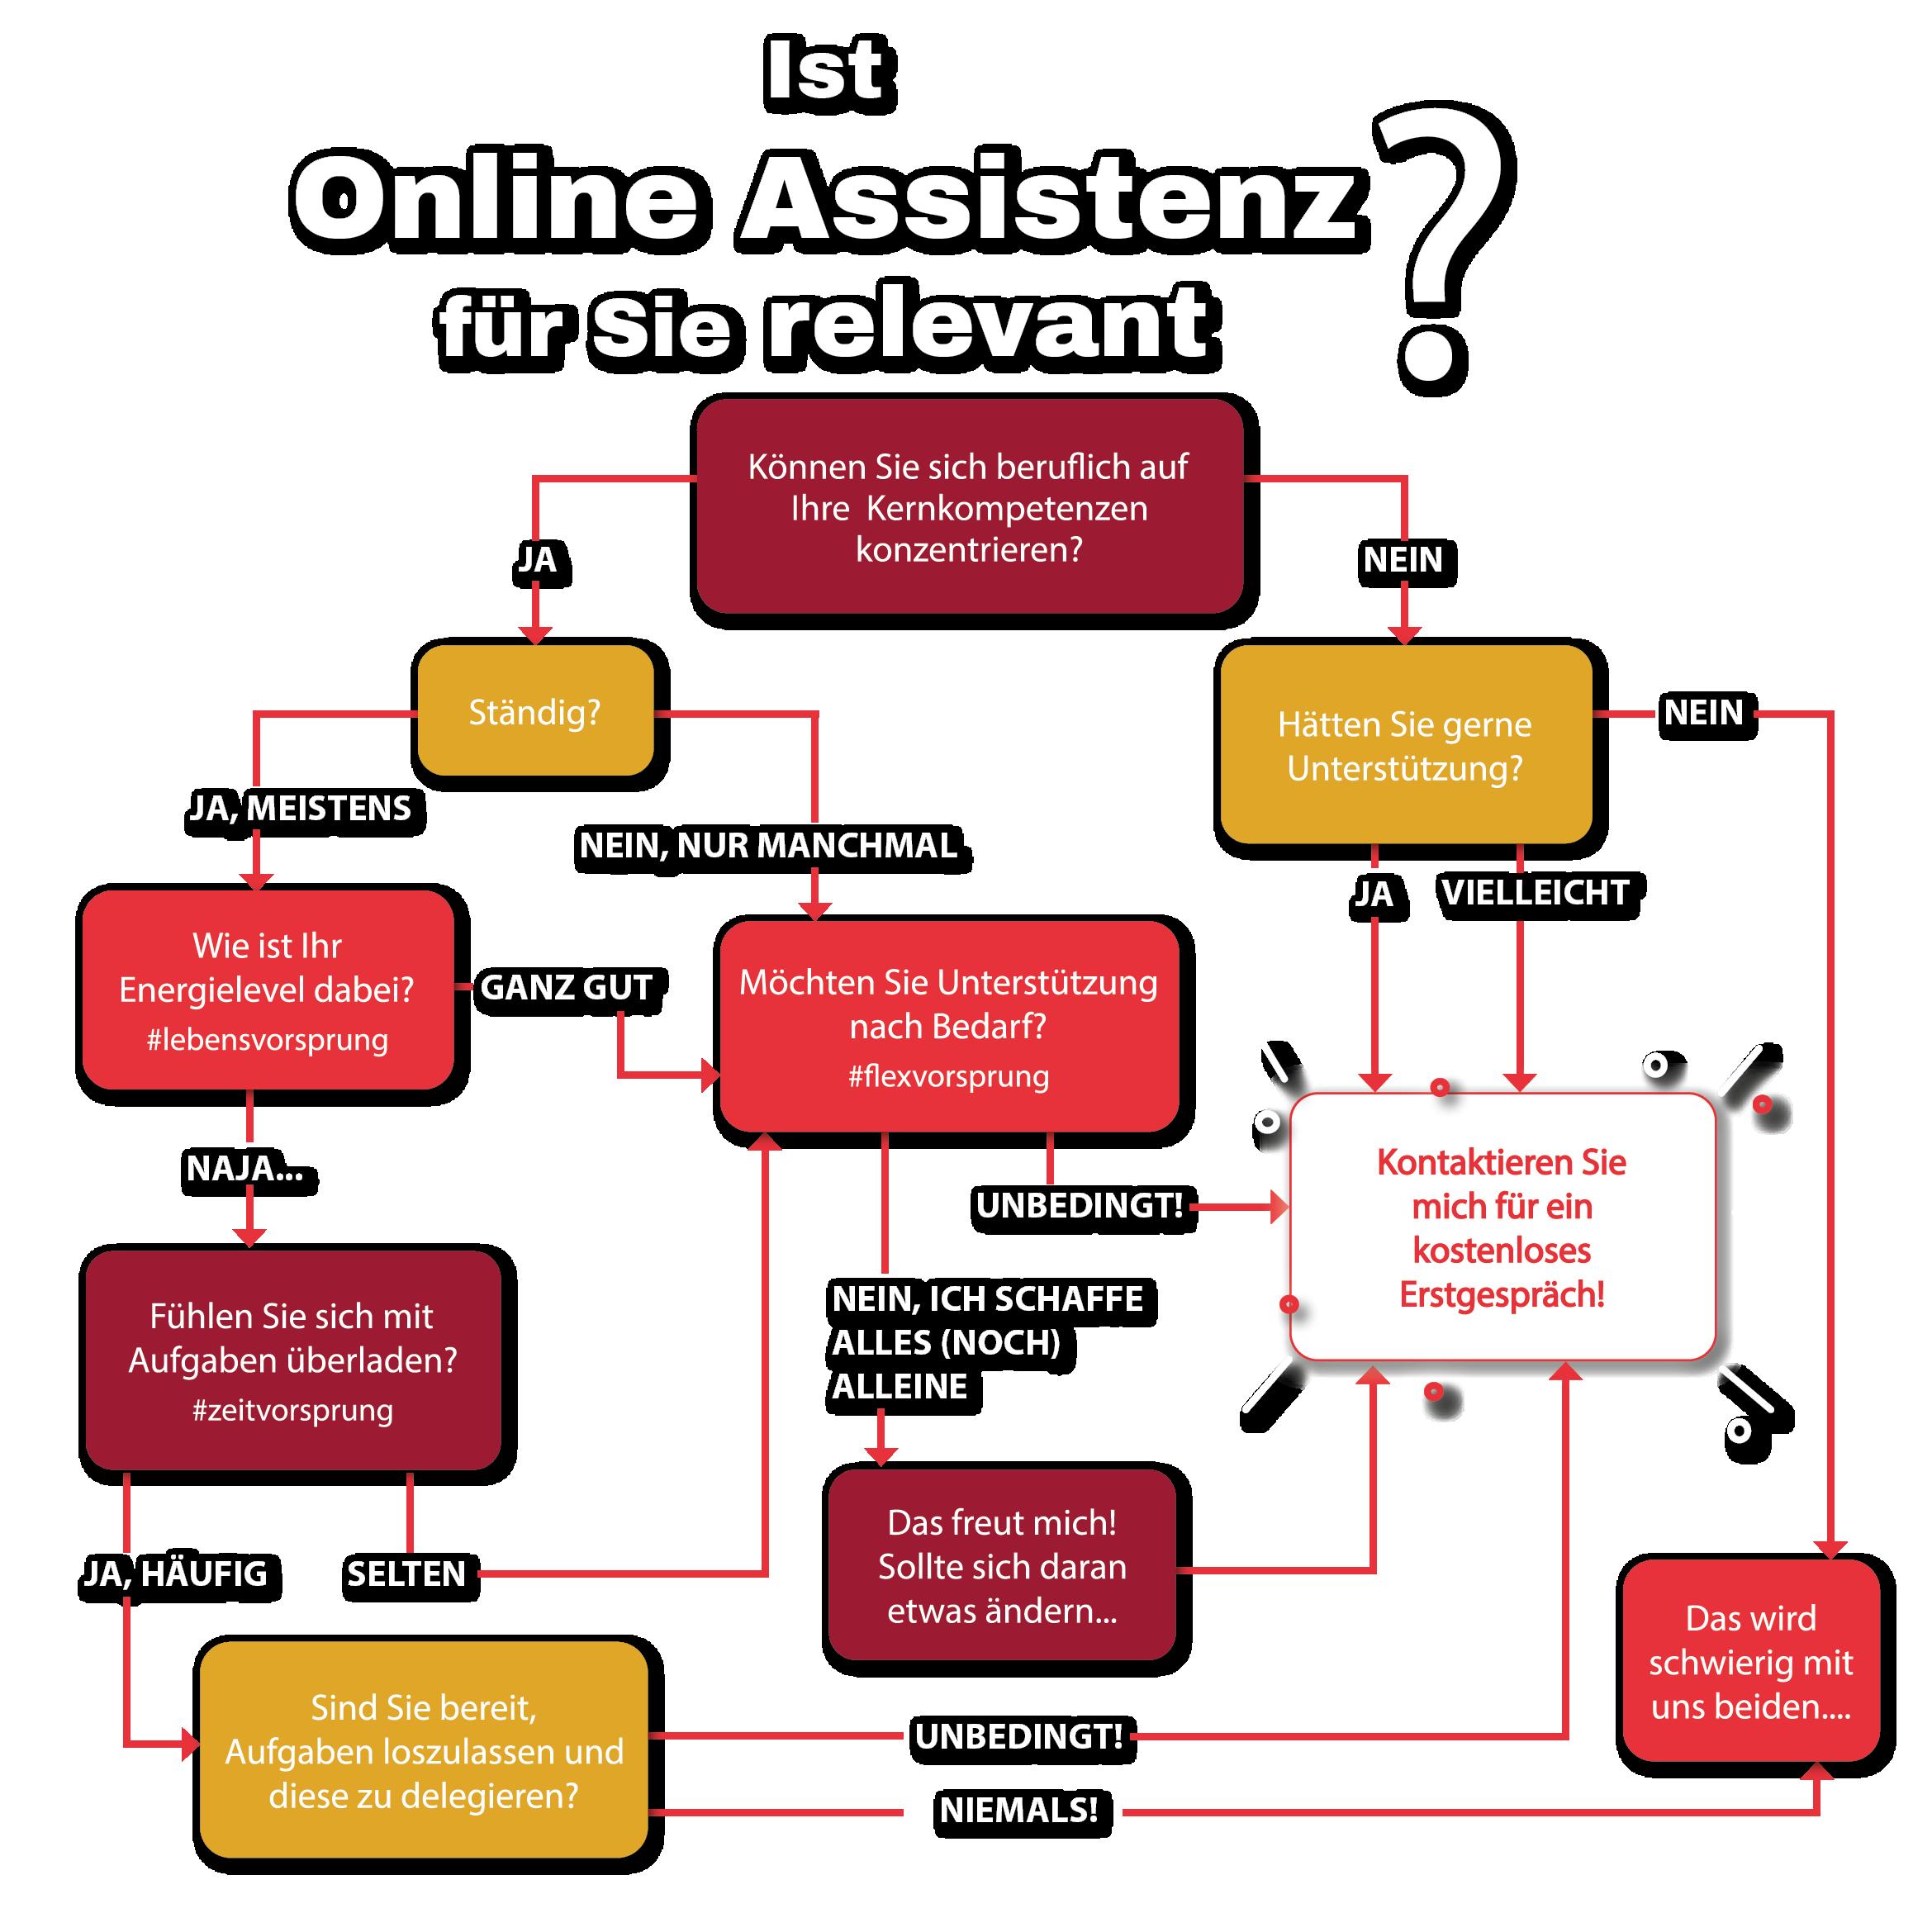 Flowchart Online Assistenz Bianca Baumgartner vorSprung Home Leistungen